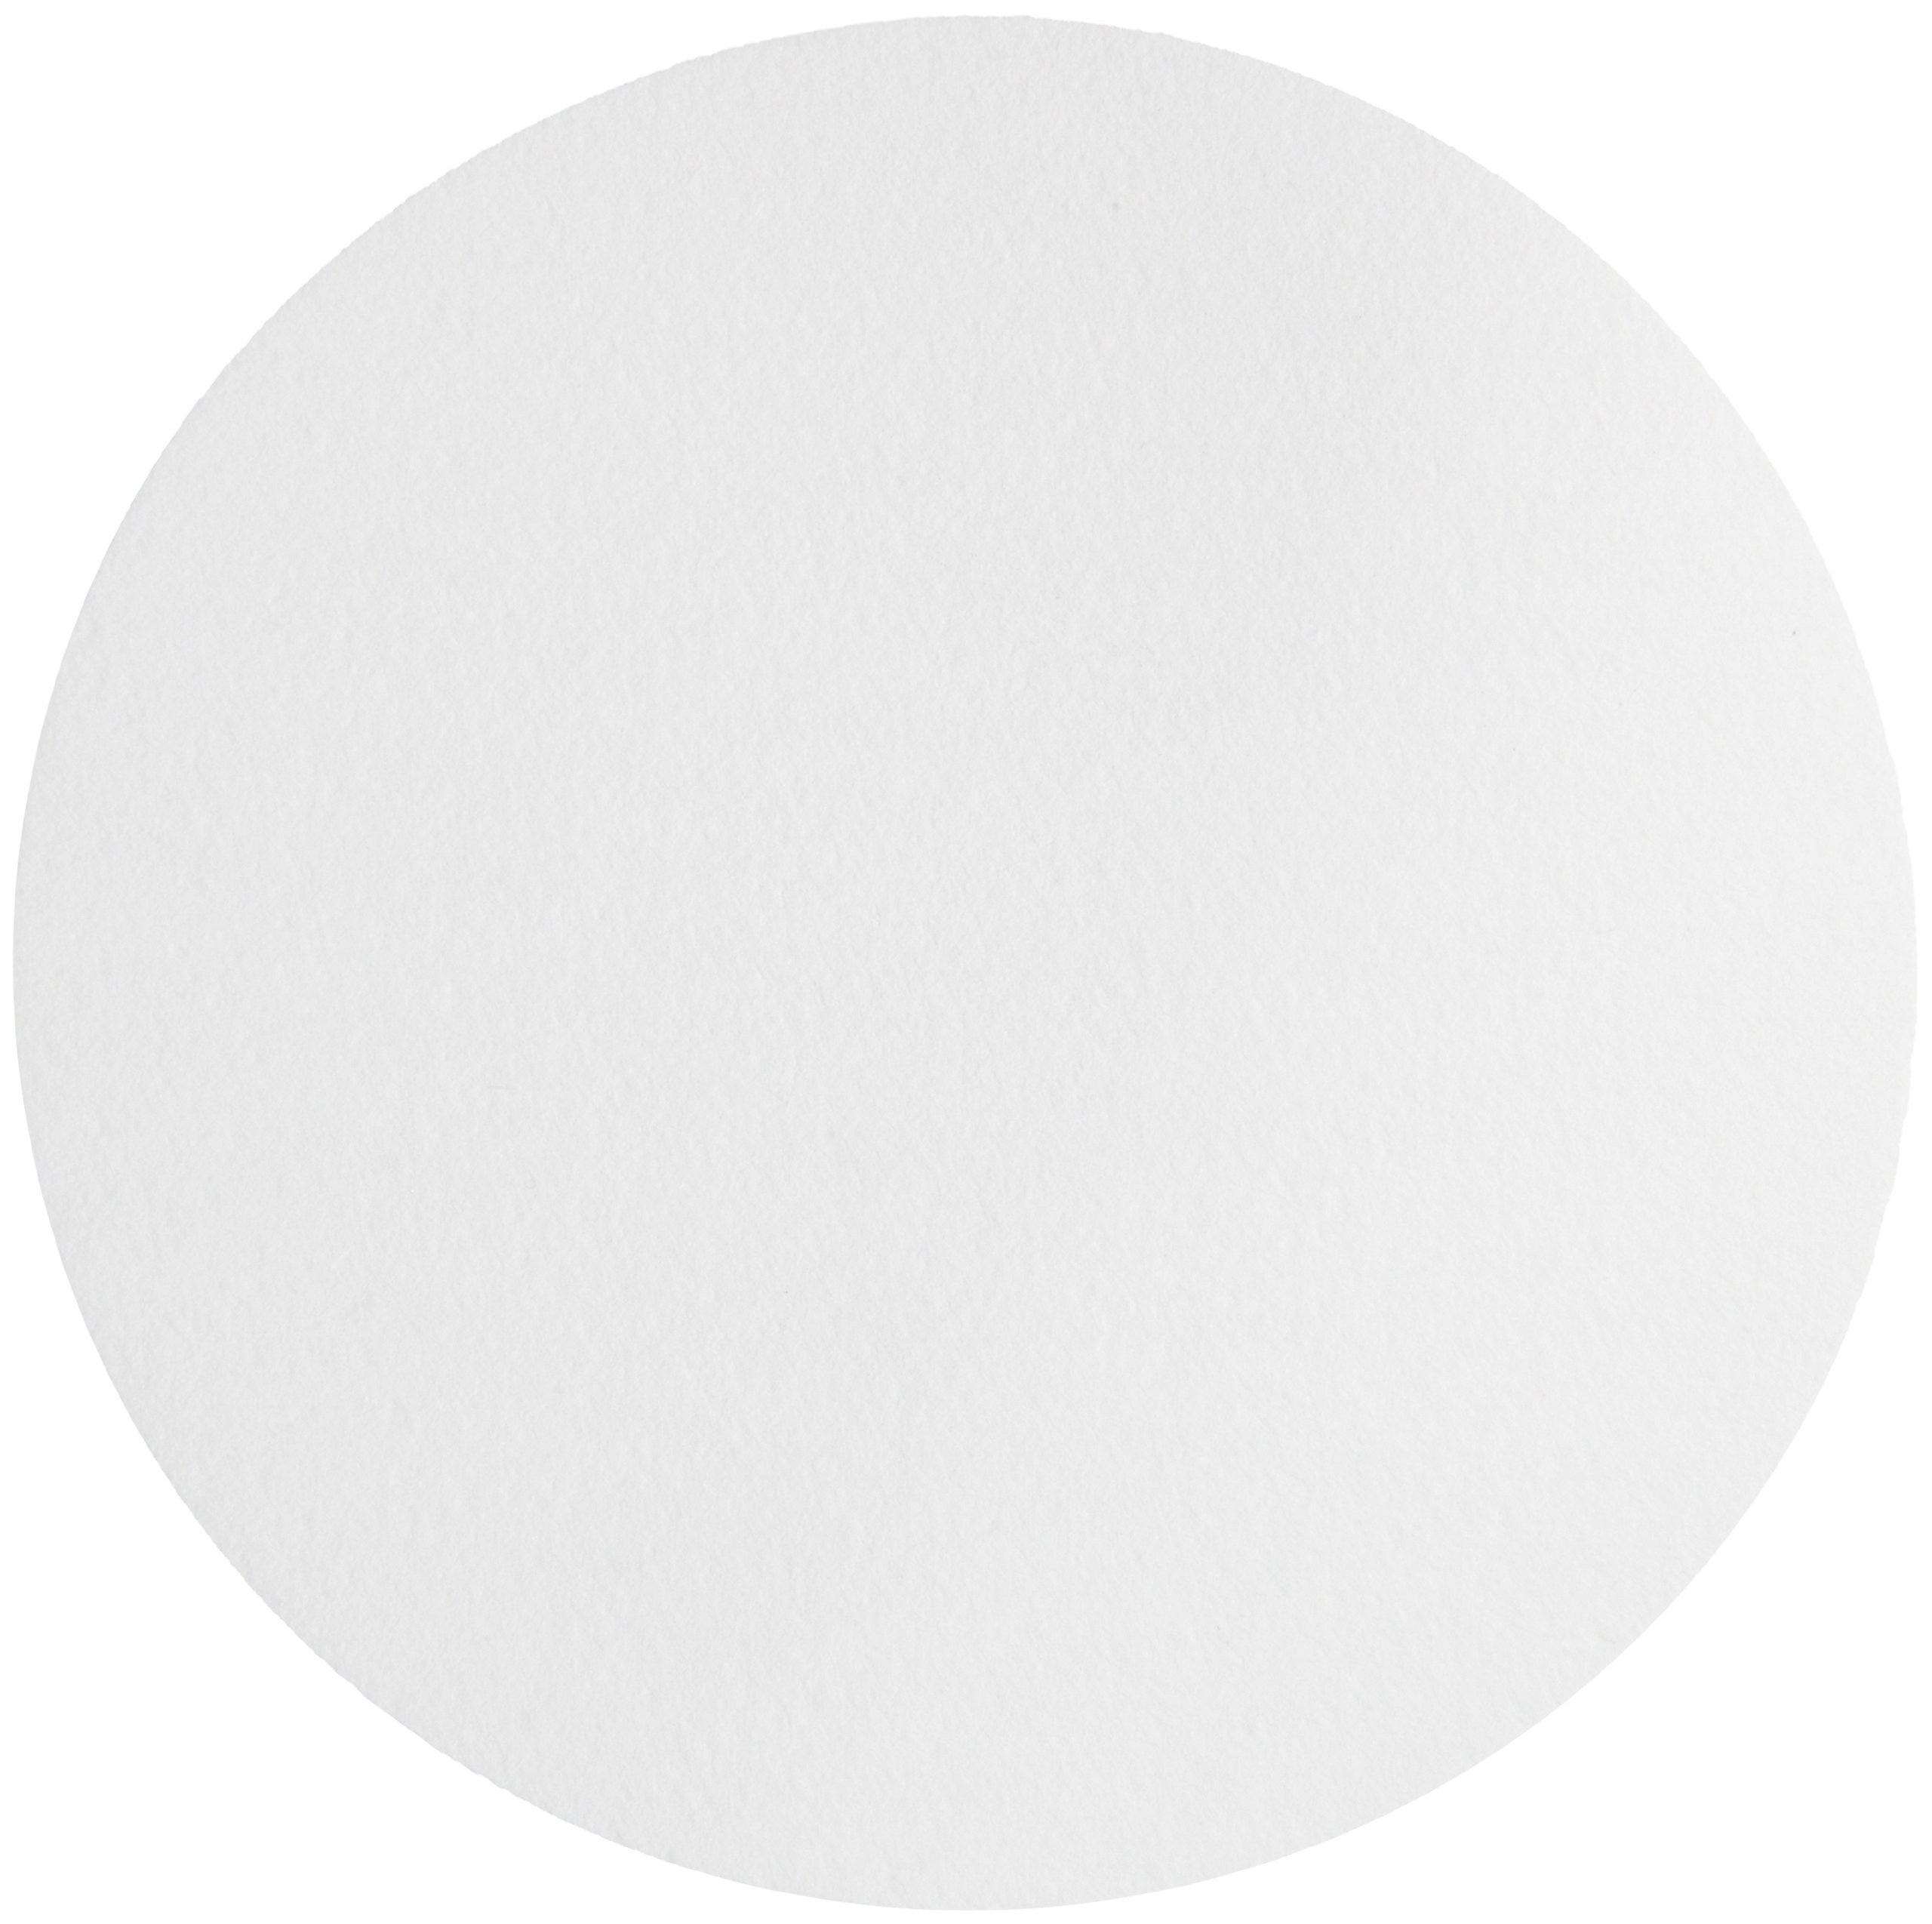 Whatman 1004-240 Quantitative Filter Paper Circles, 20-25 Micron, 3.7 s/100mL/sq inch Flow Rate, Grade 4, 240mm Diameter (Pack of 100) by Whatman